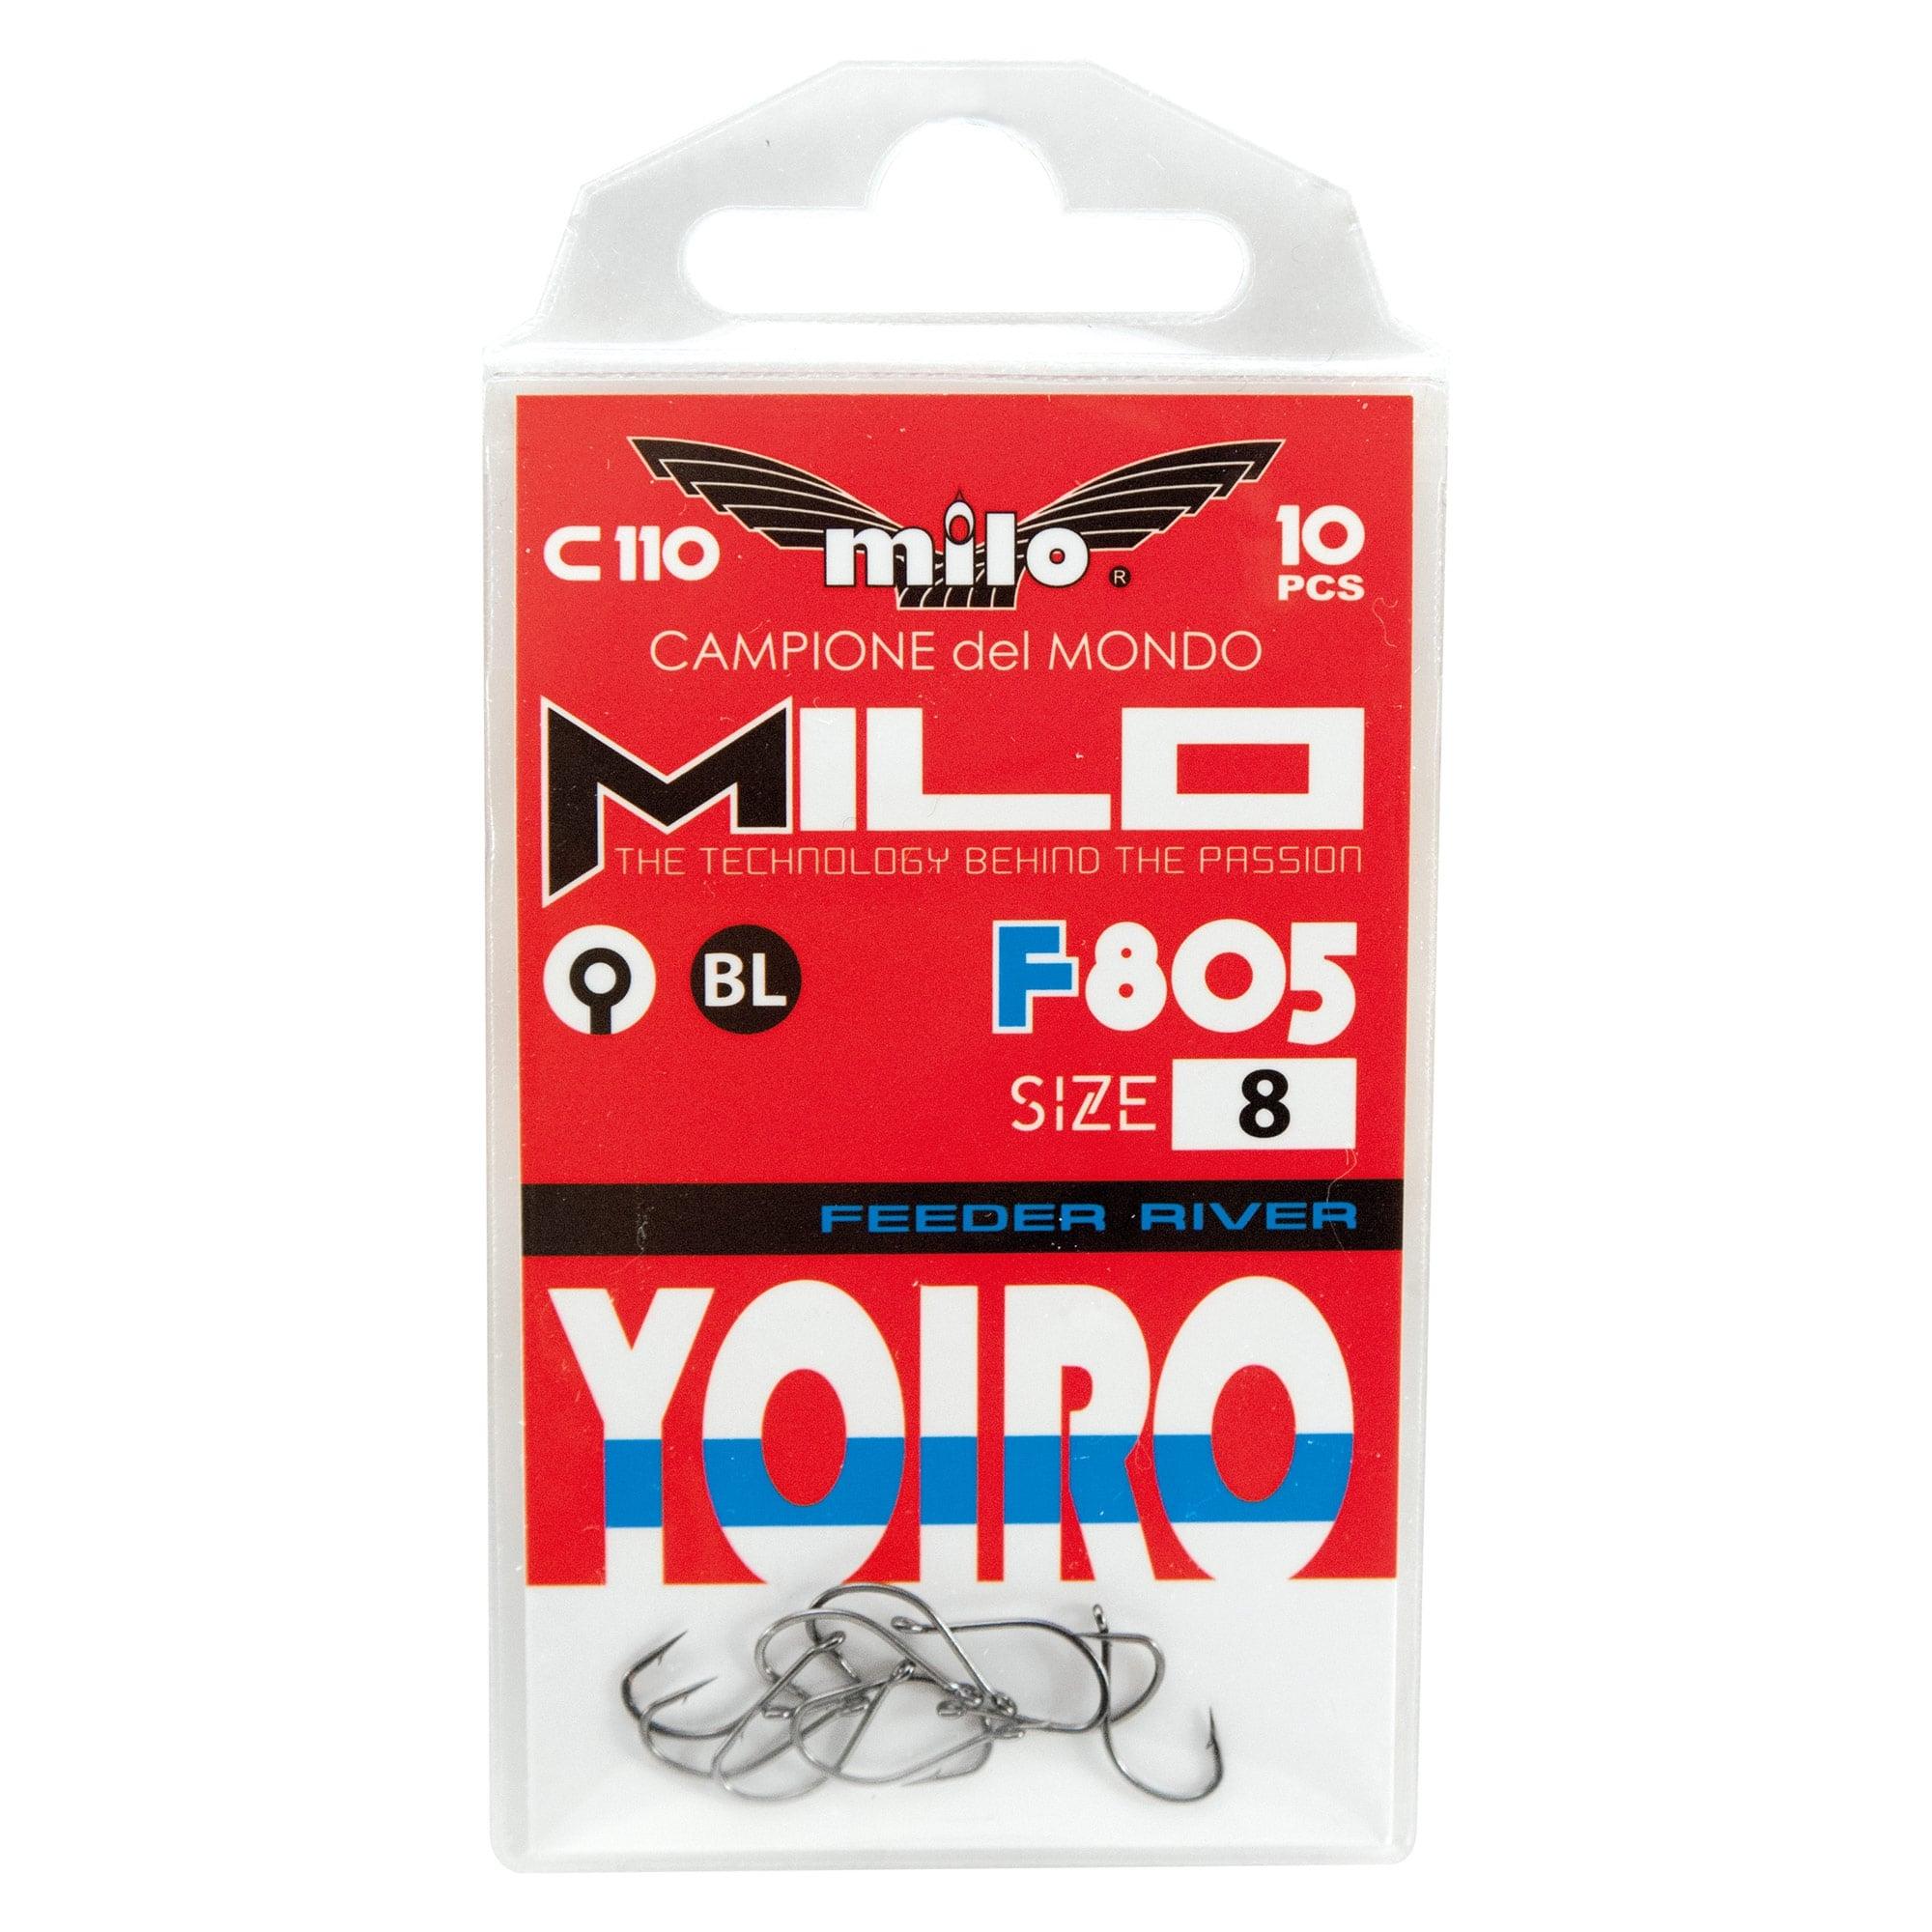 AMI YOIRO F805 Bl Feeder River MILO (10pz)